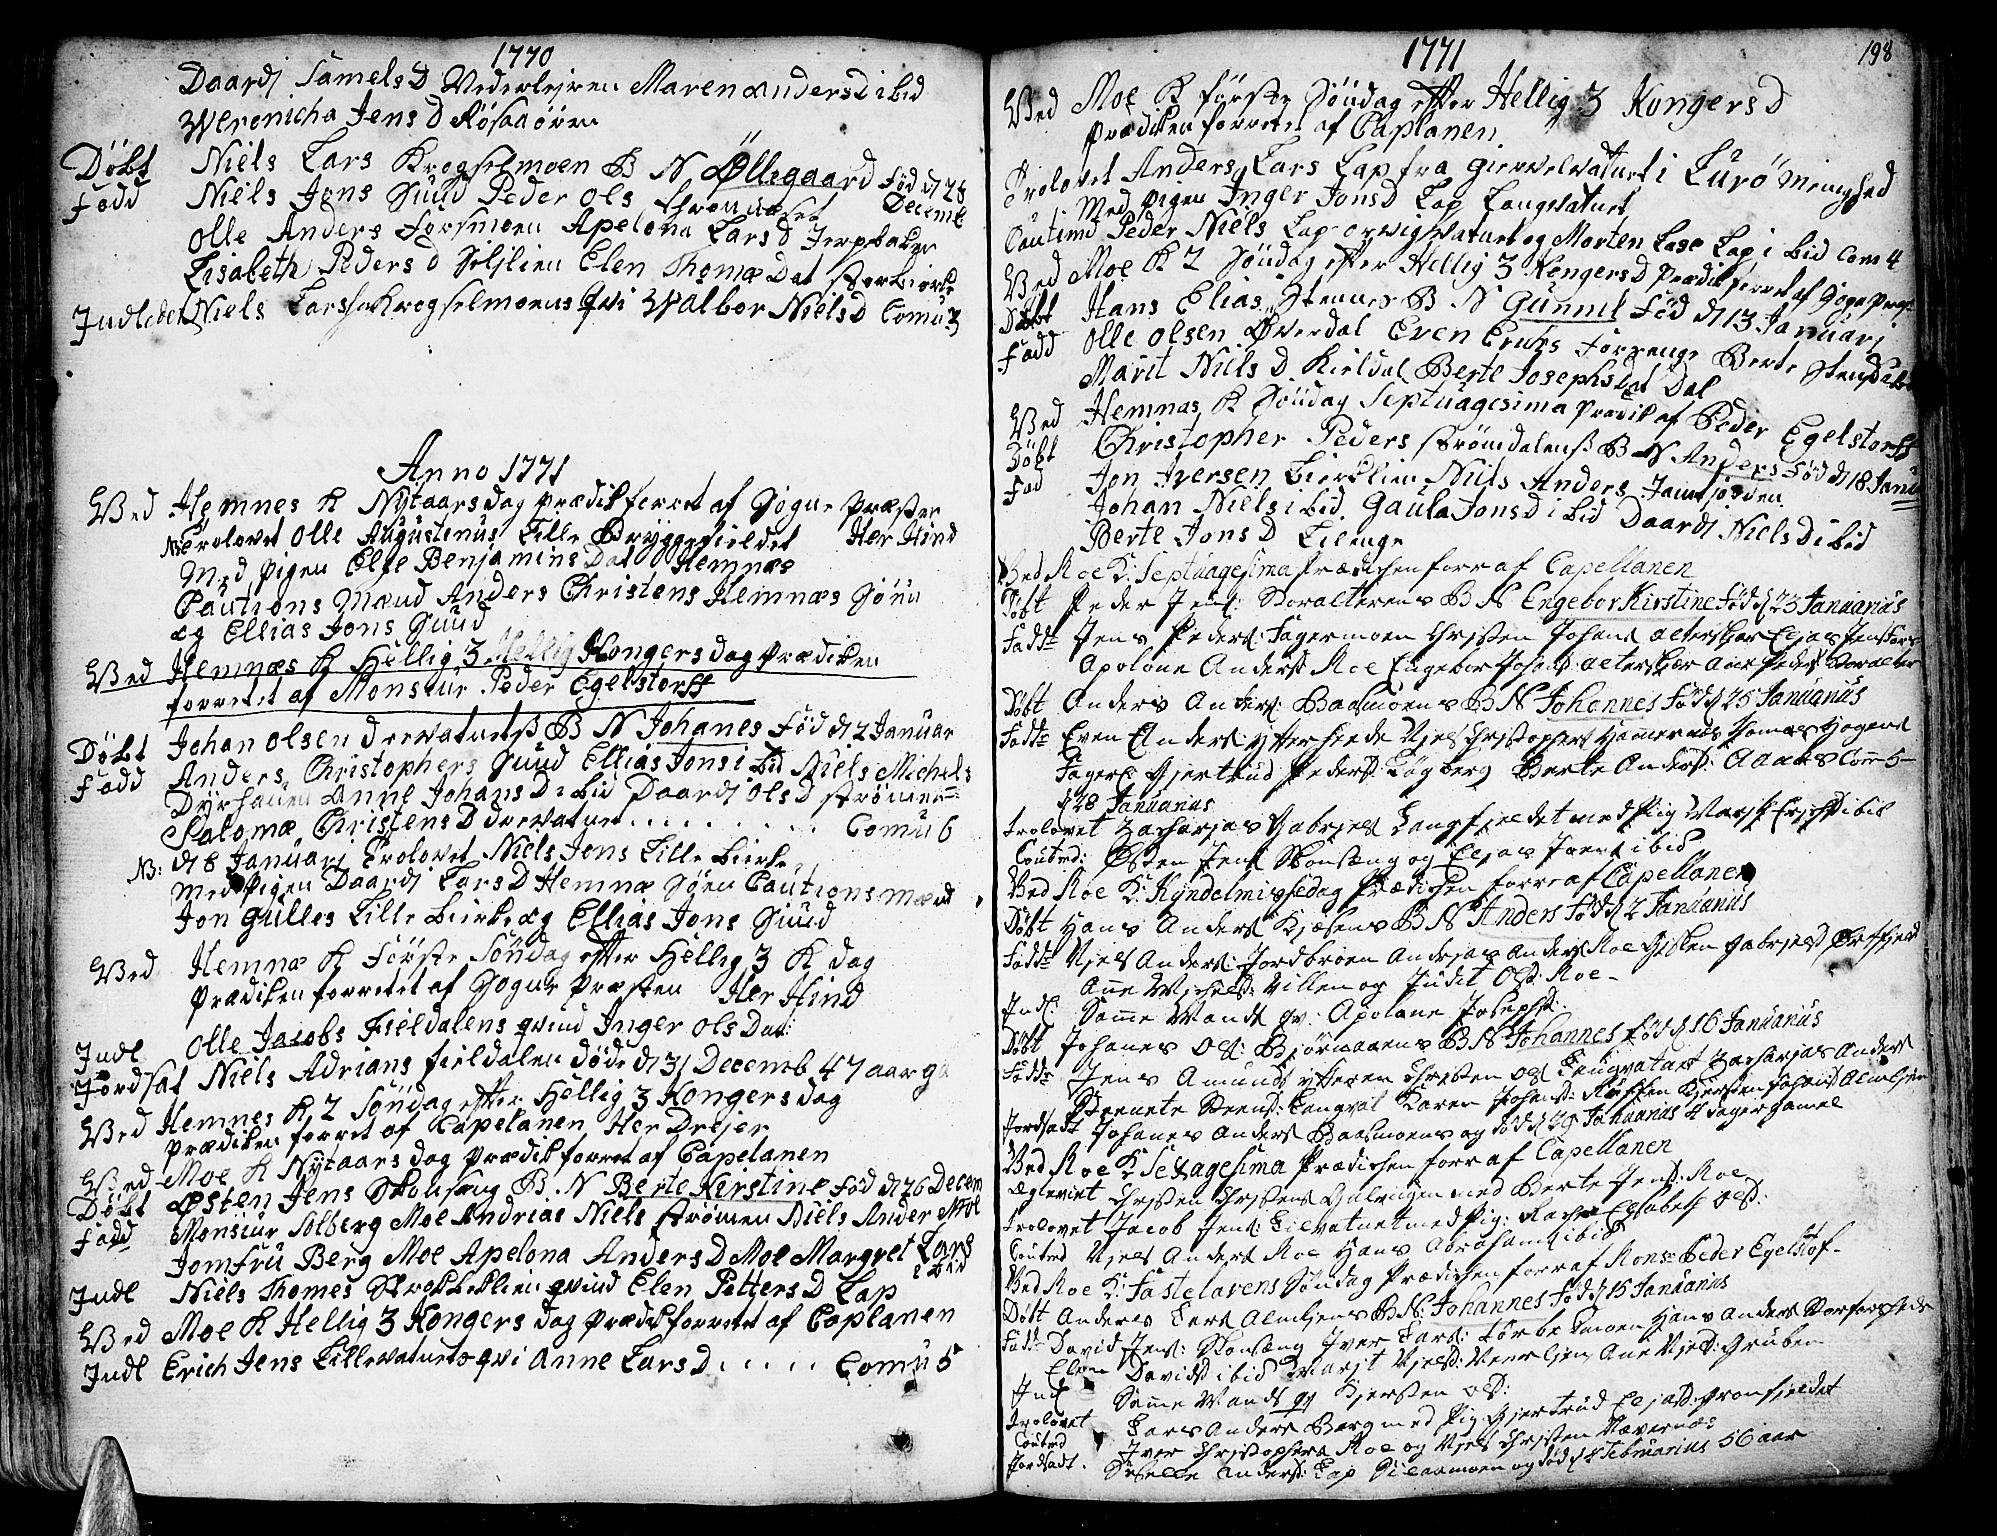 SAT, Ministerialprotokoller, klokkerbøker og fødselsregistre - Nordland, 825/L0348: Ministerialbok nr. 825A04, 1752-1788, s. 198